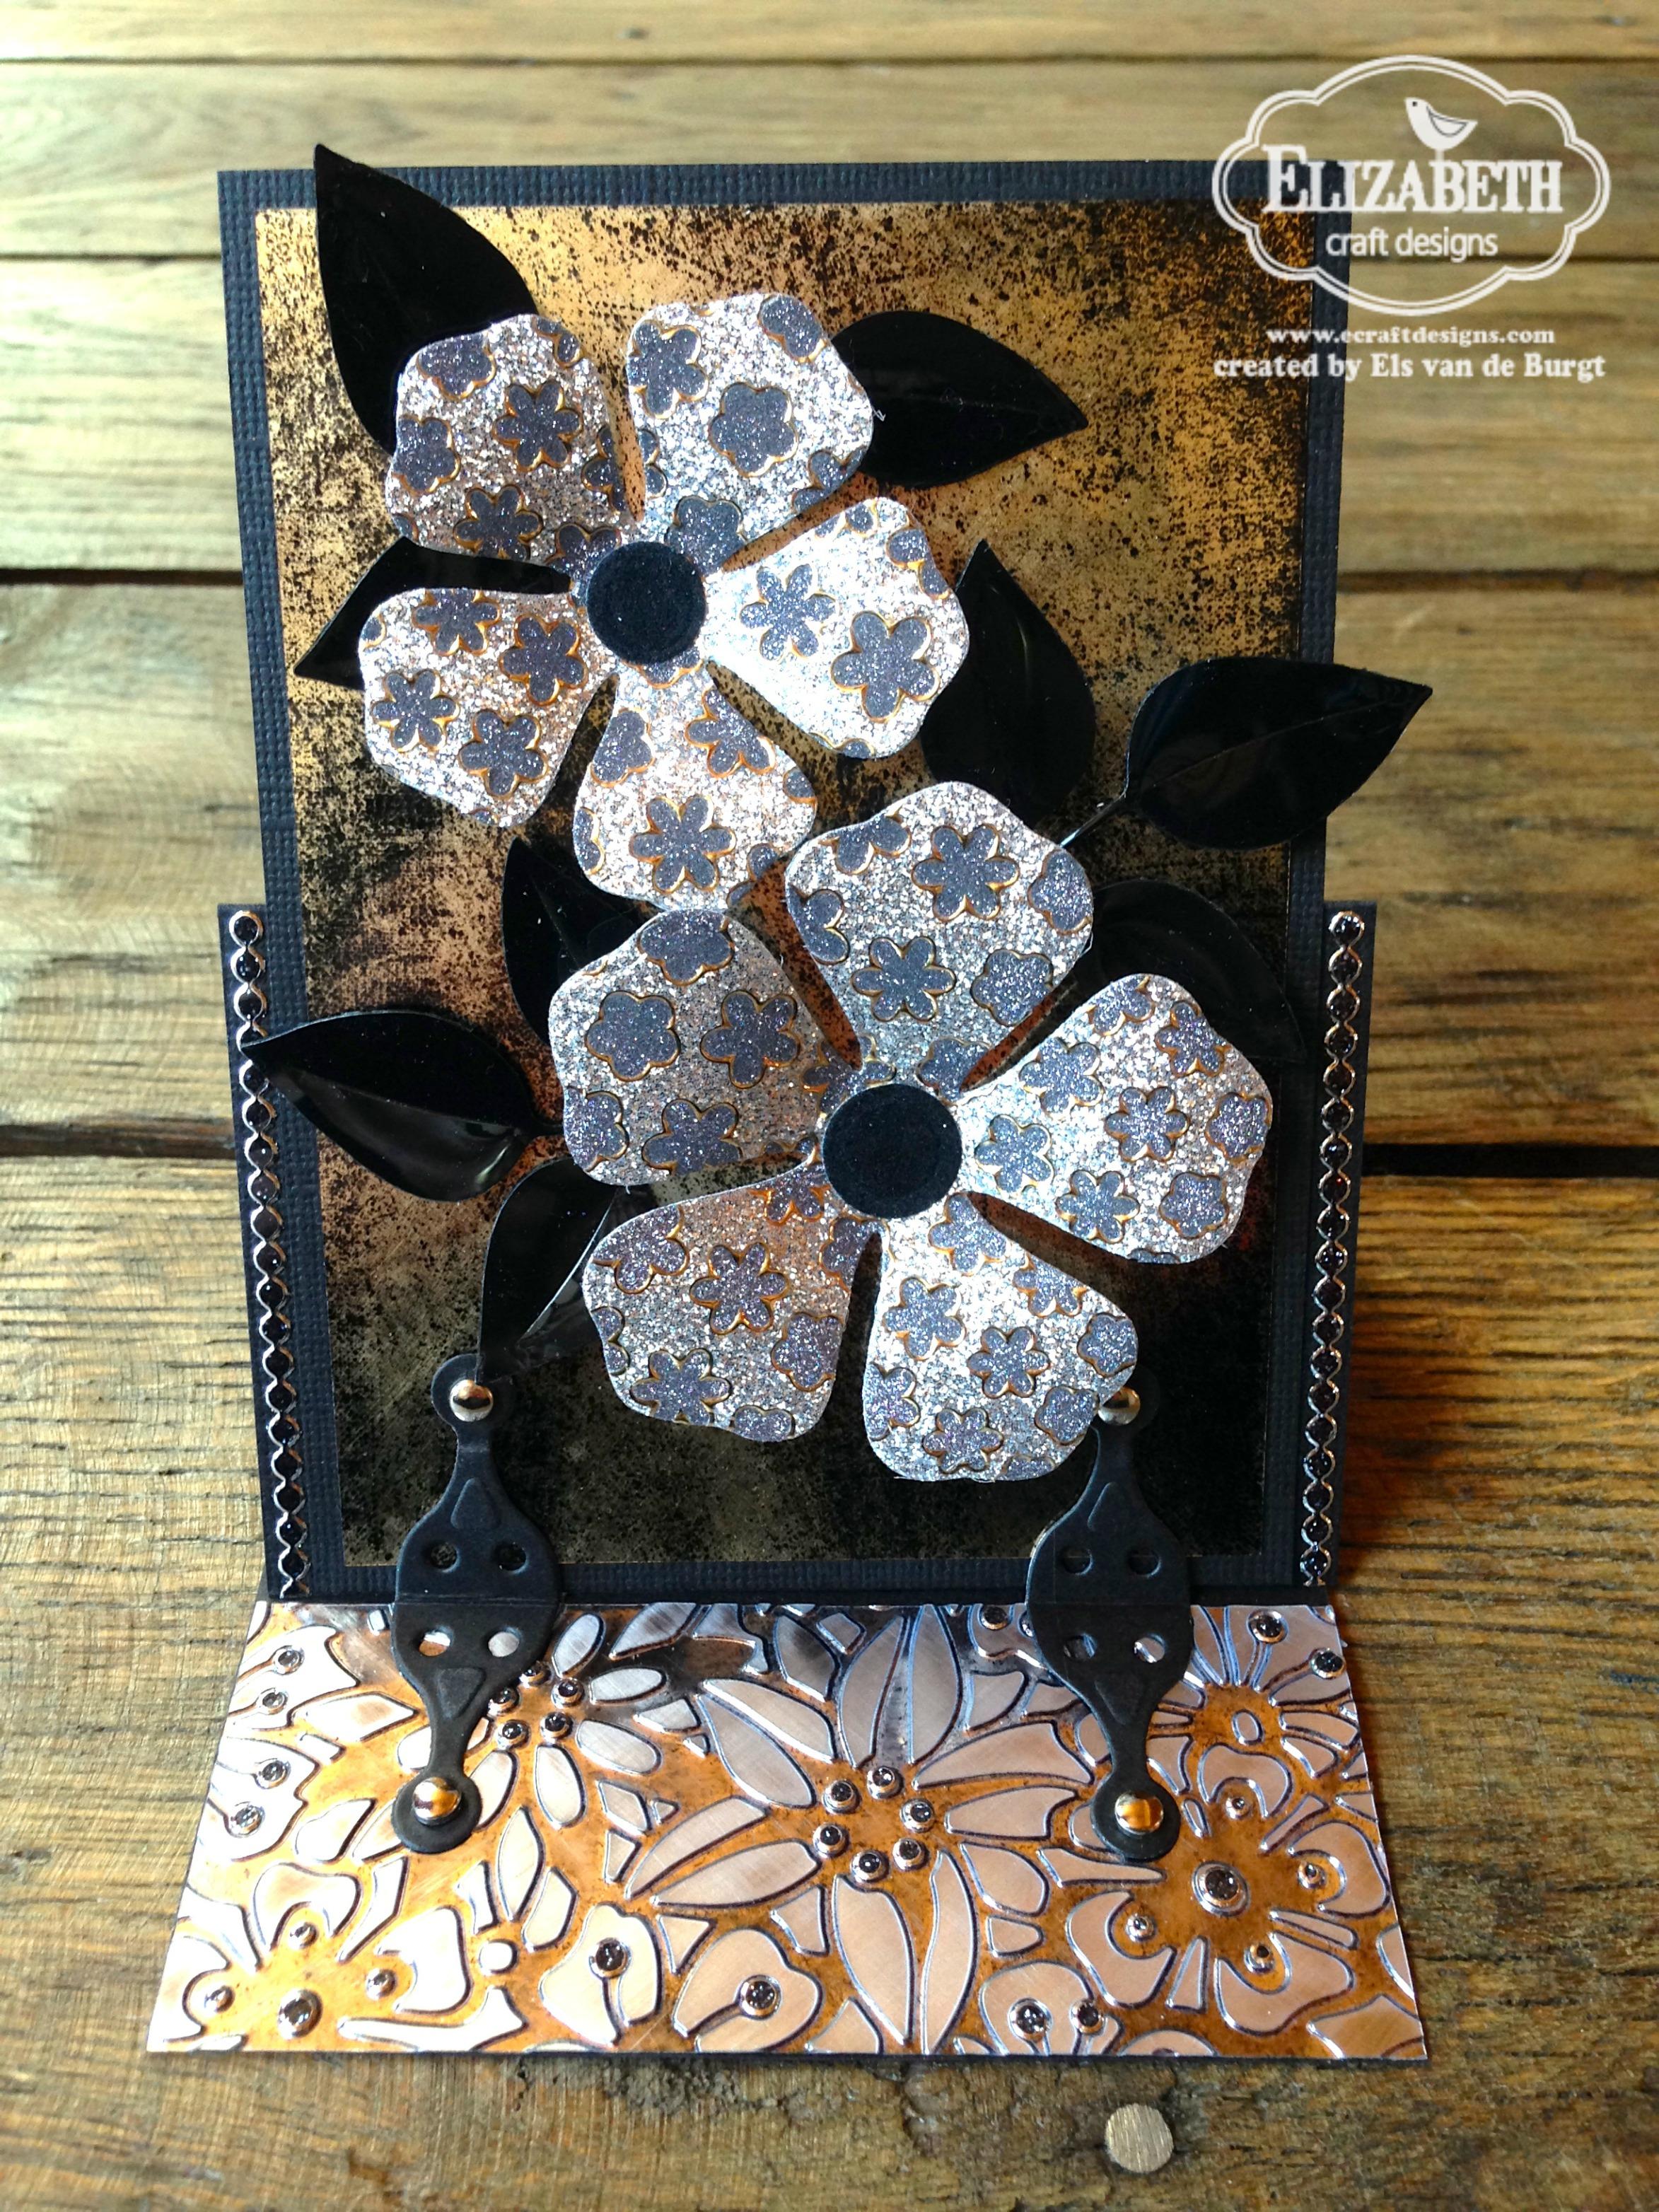 Elizabeth Craft Designs Stand Up Helpers : Flower power stand up helper card u elizabeth craft designs